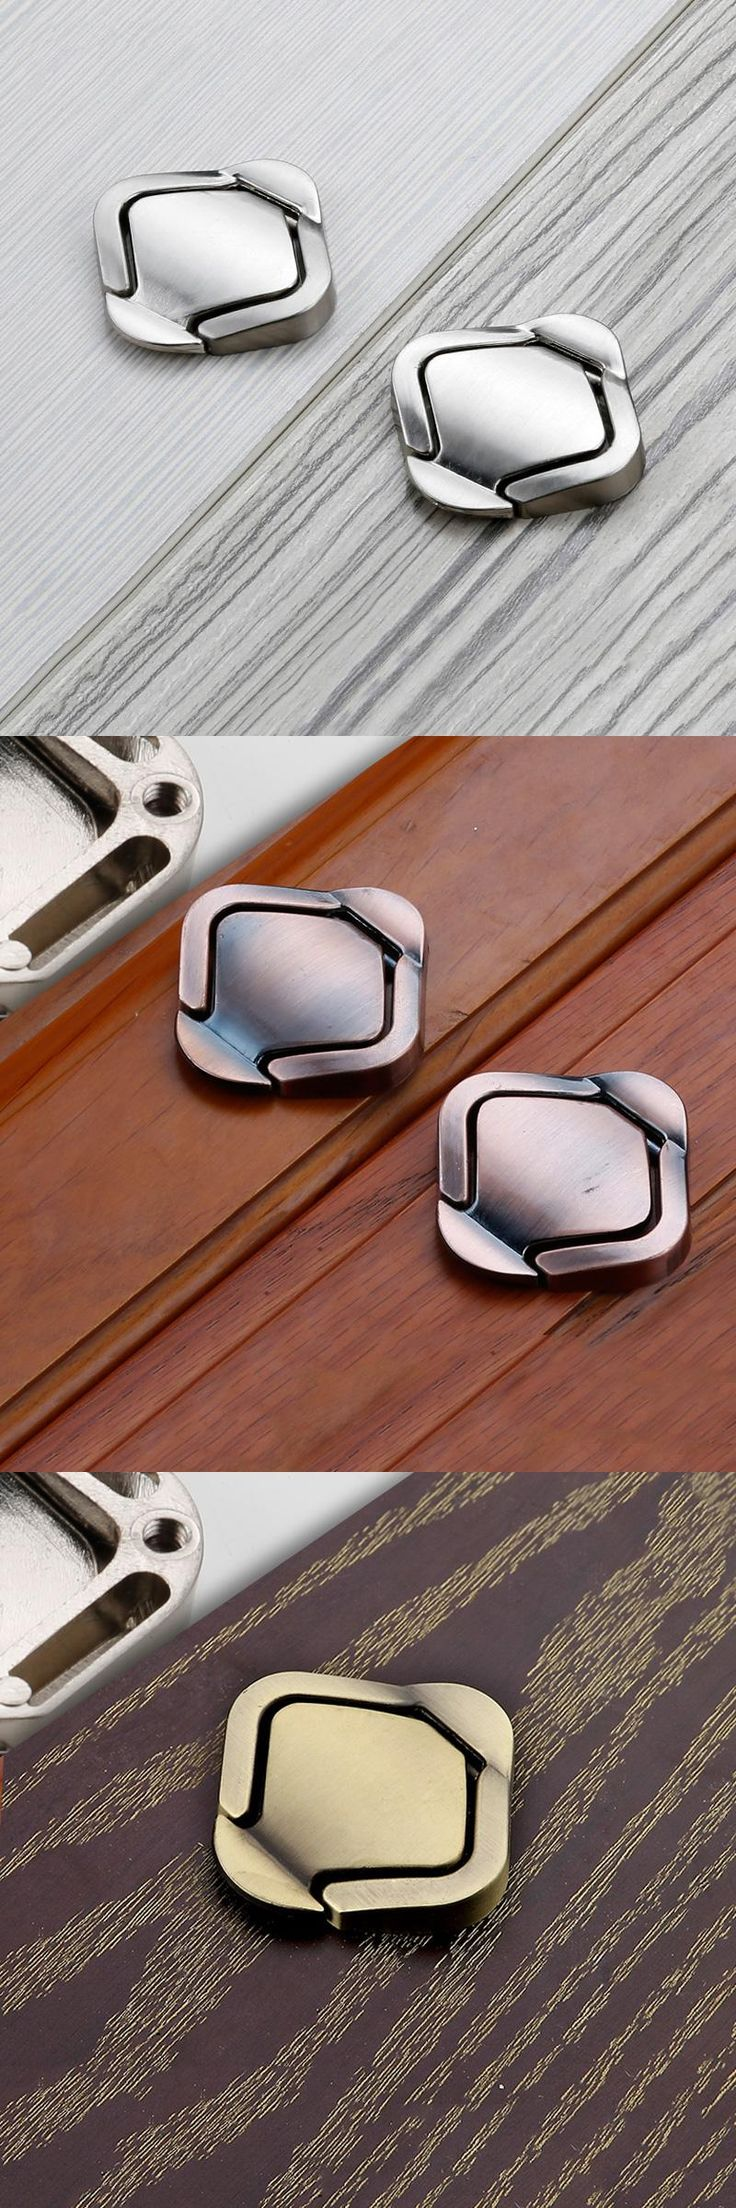 [Visit to Buy] 1pcs Cabinet  furniture hidden Recessed Flush Pull Nckel window handle sliding door knob #Advertisement